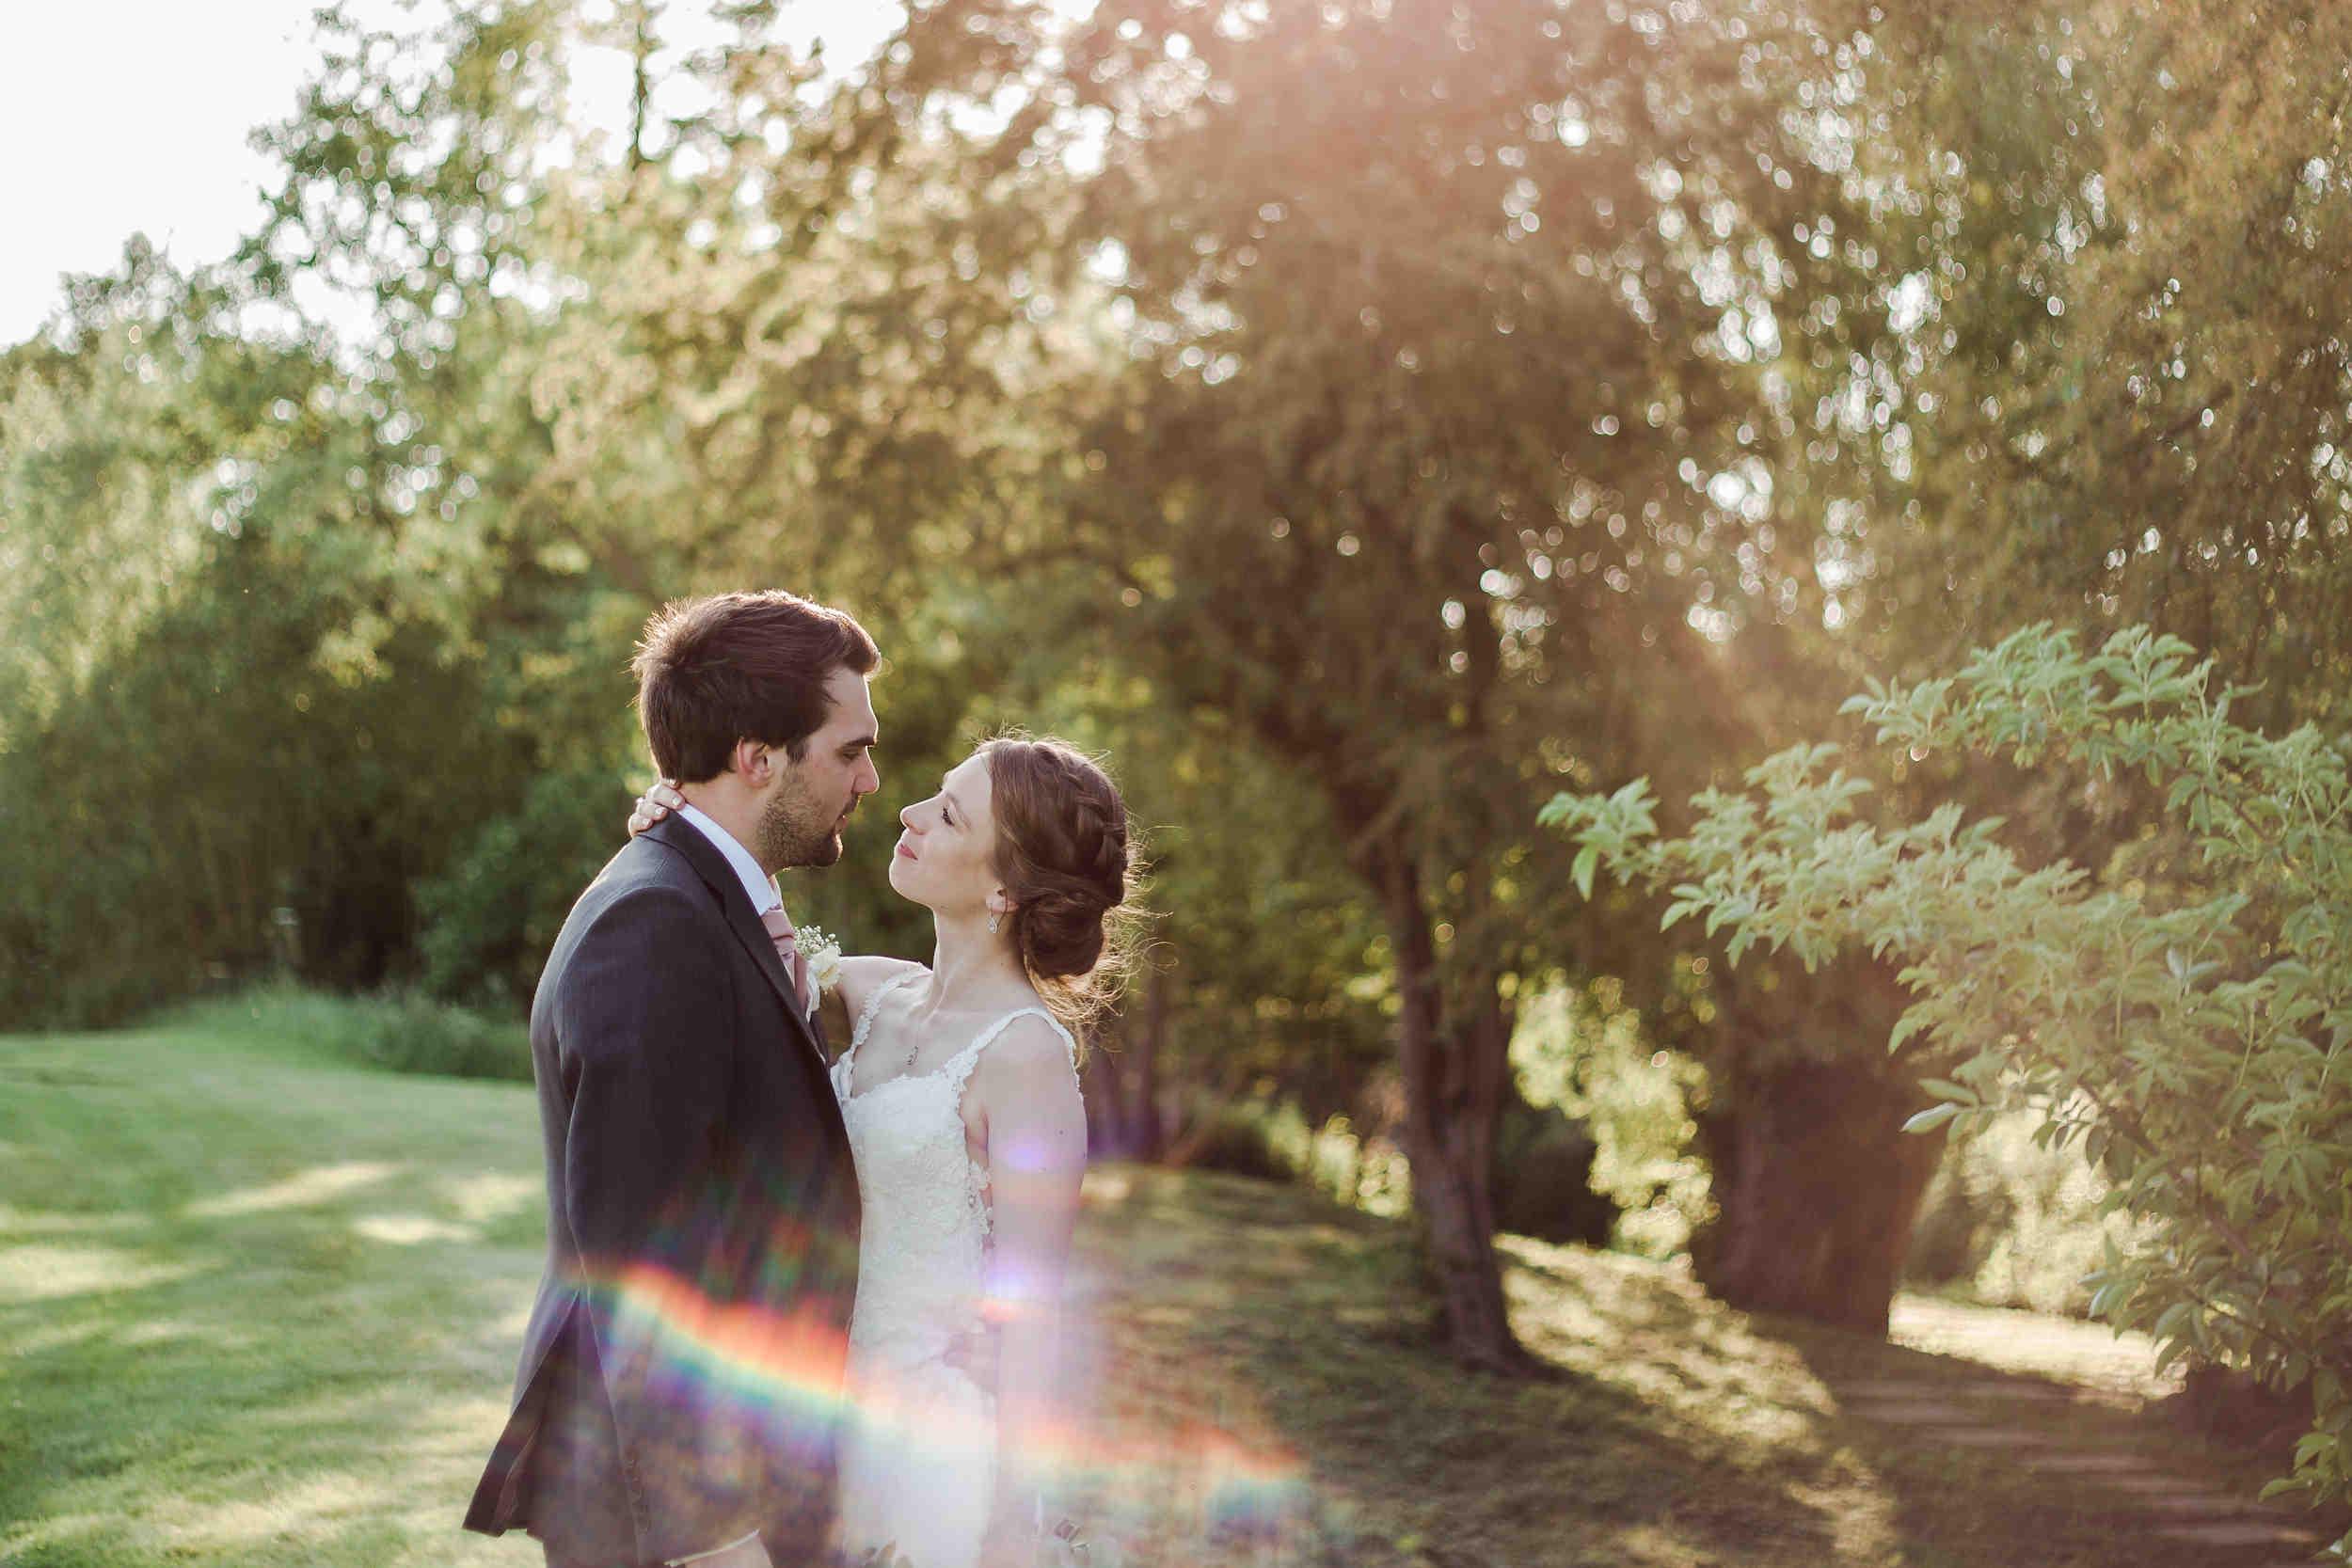 Modern_Stylish_Wedding_at_Swallows_Nest_Barn1280